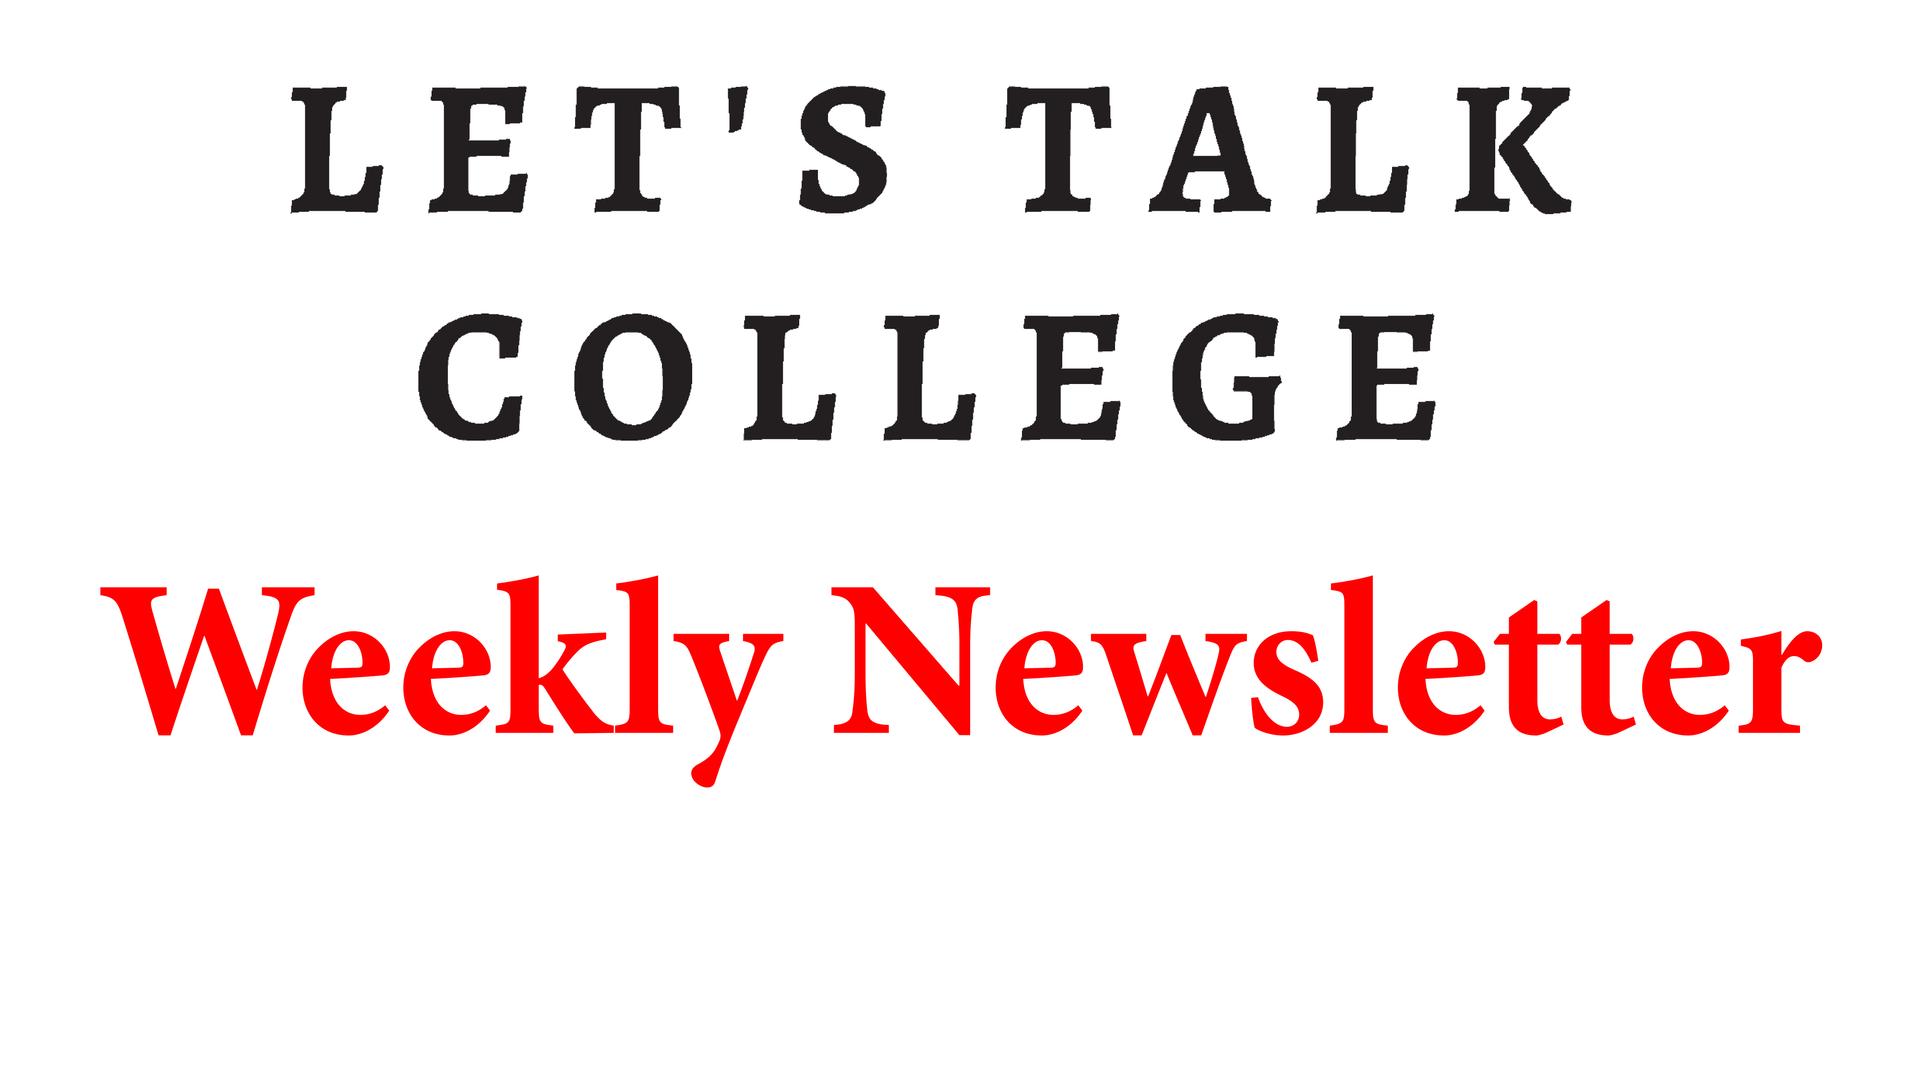 Let's Talk College Newsletter Button